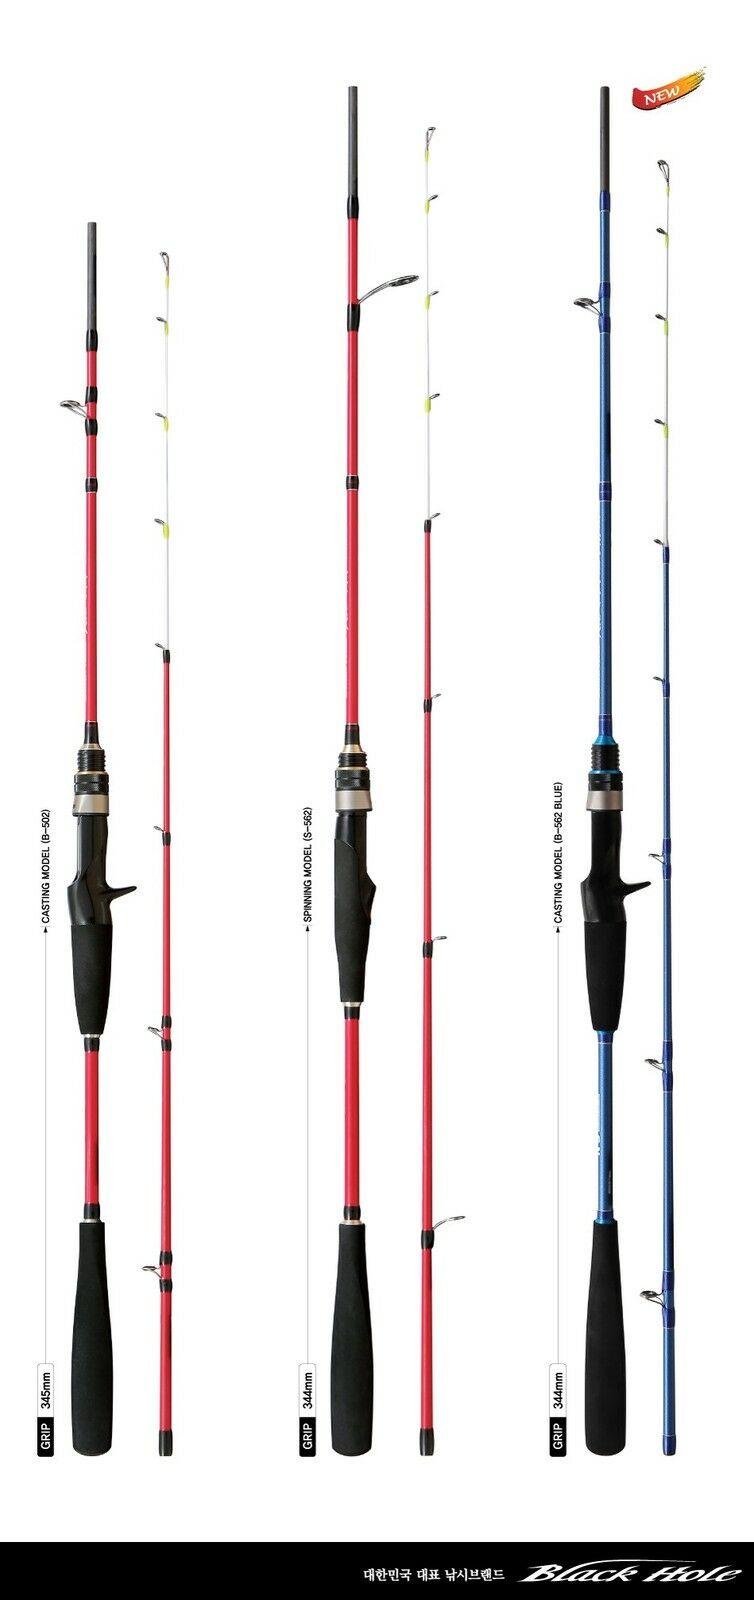 NS RODS BLACK HOLE SQUID FISHING BOAT ROD JJUGING